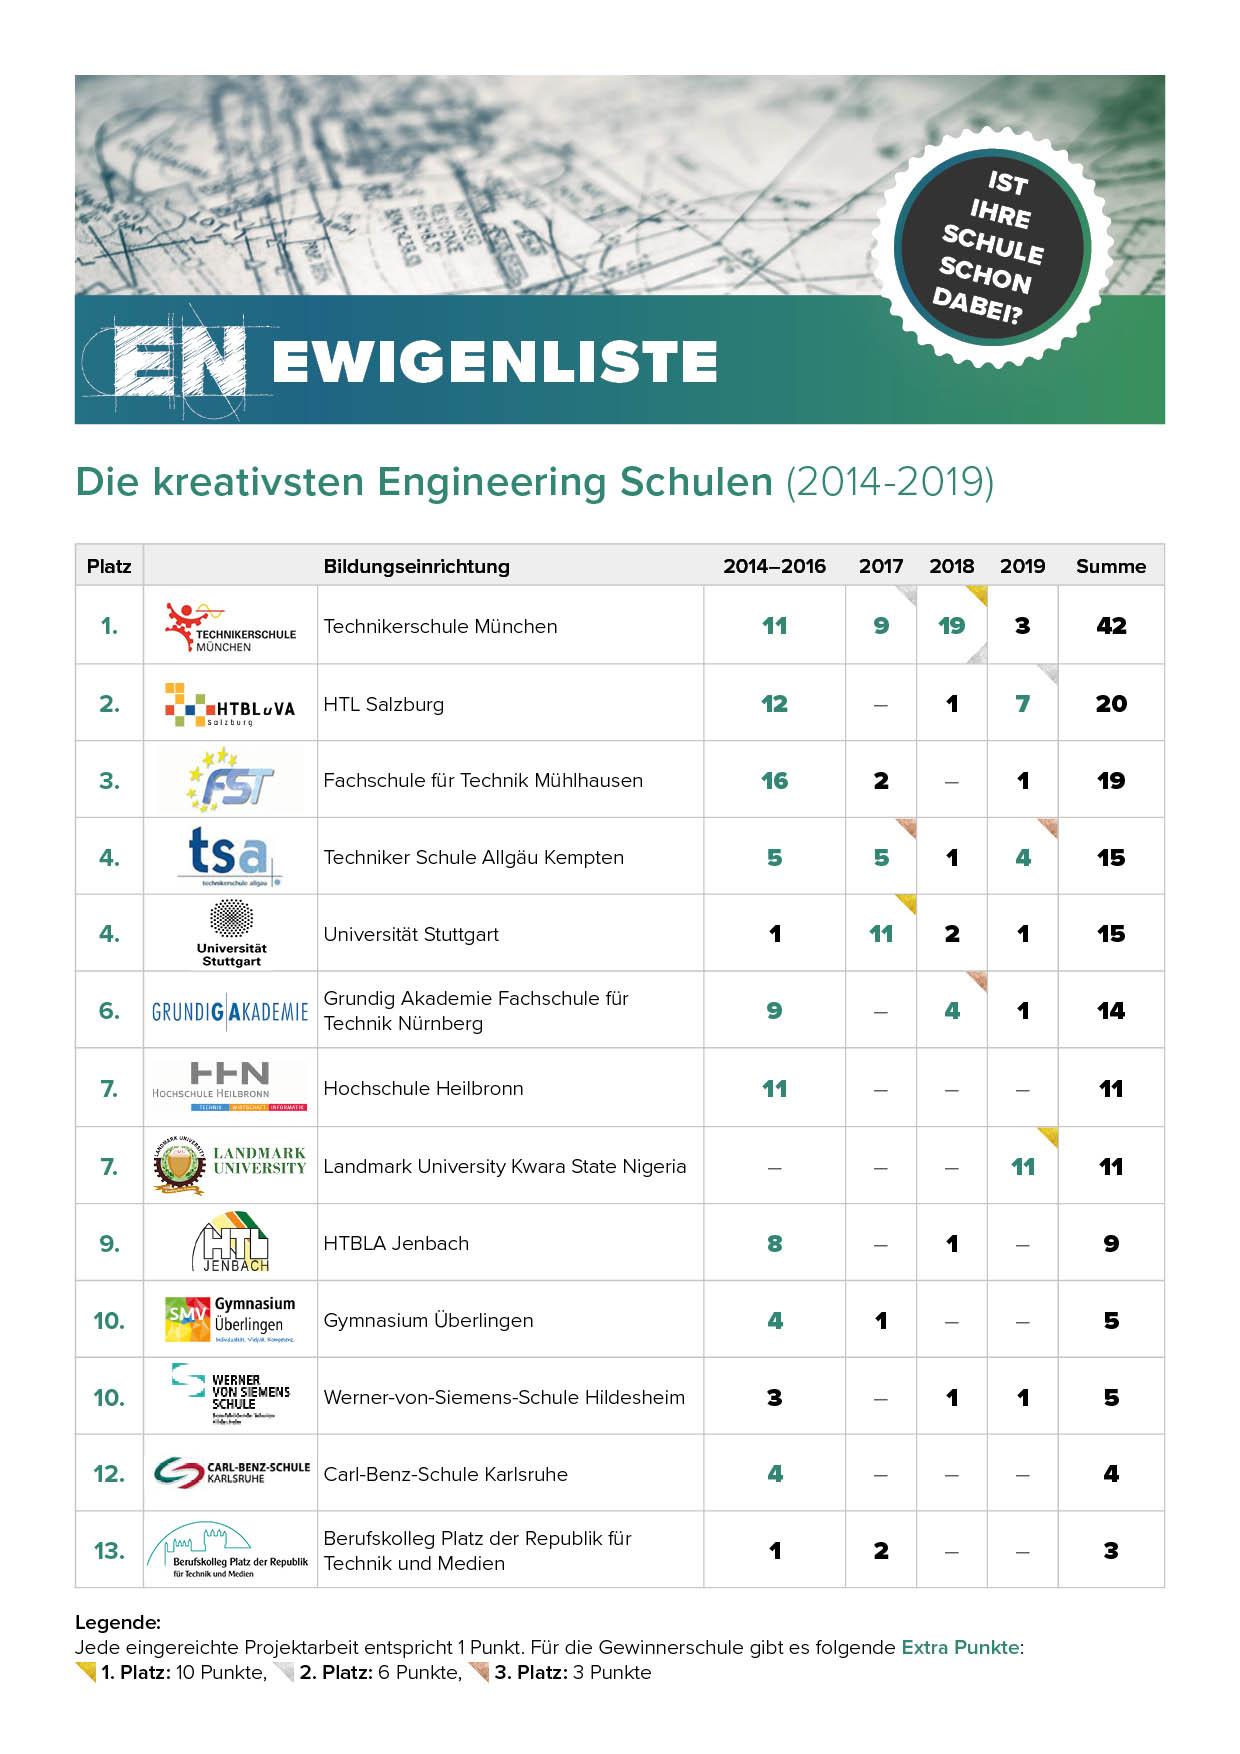 Ewigenliste 2014-2019